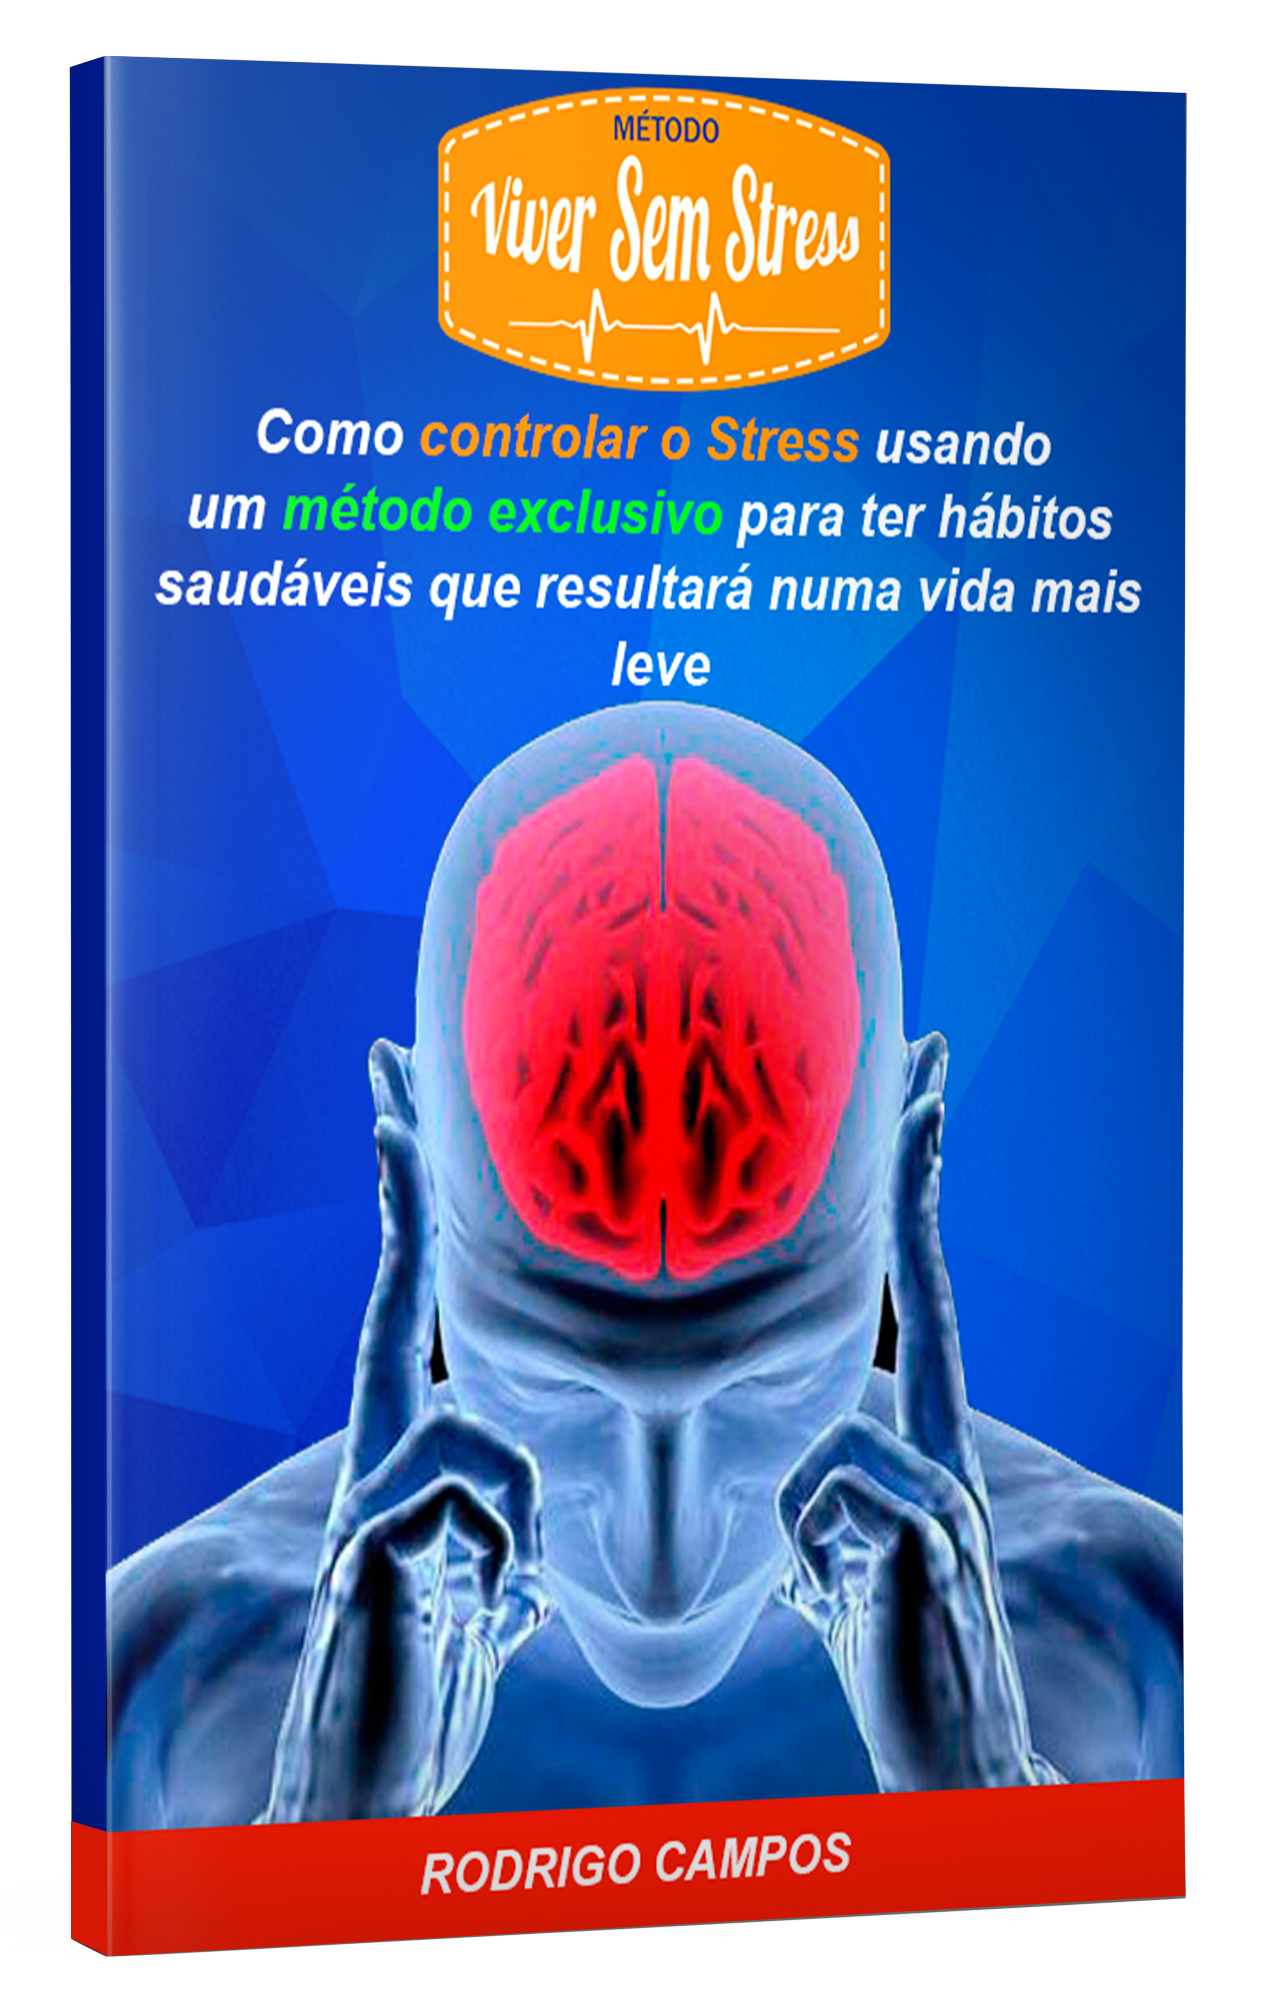 Método Viver Sem Stress